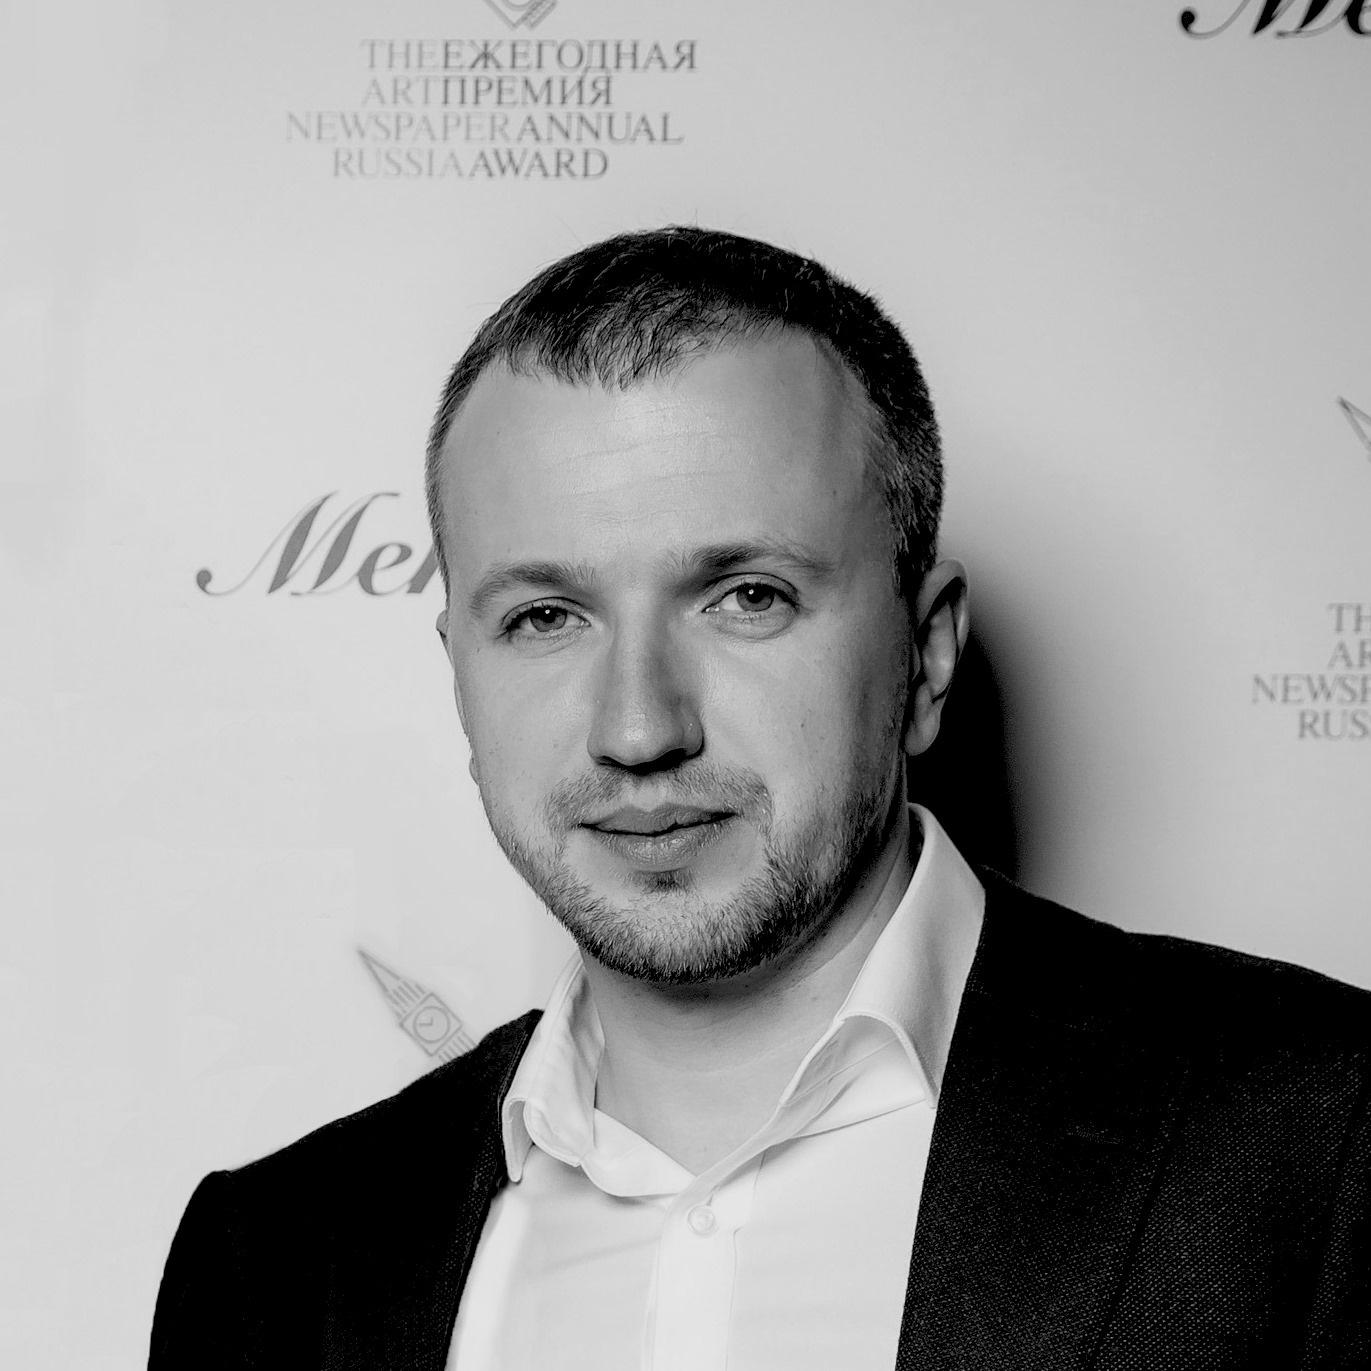 Andrey Belyakov